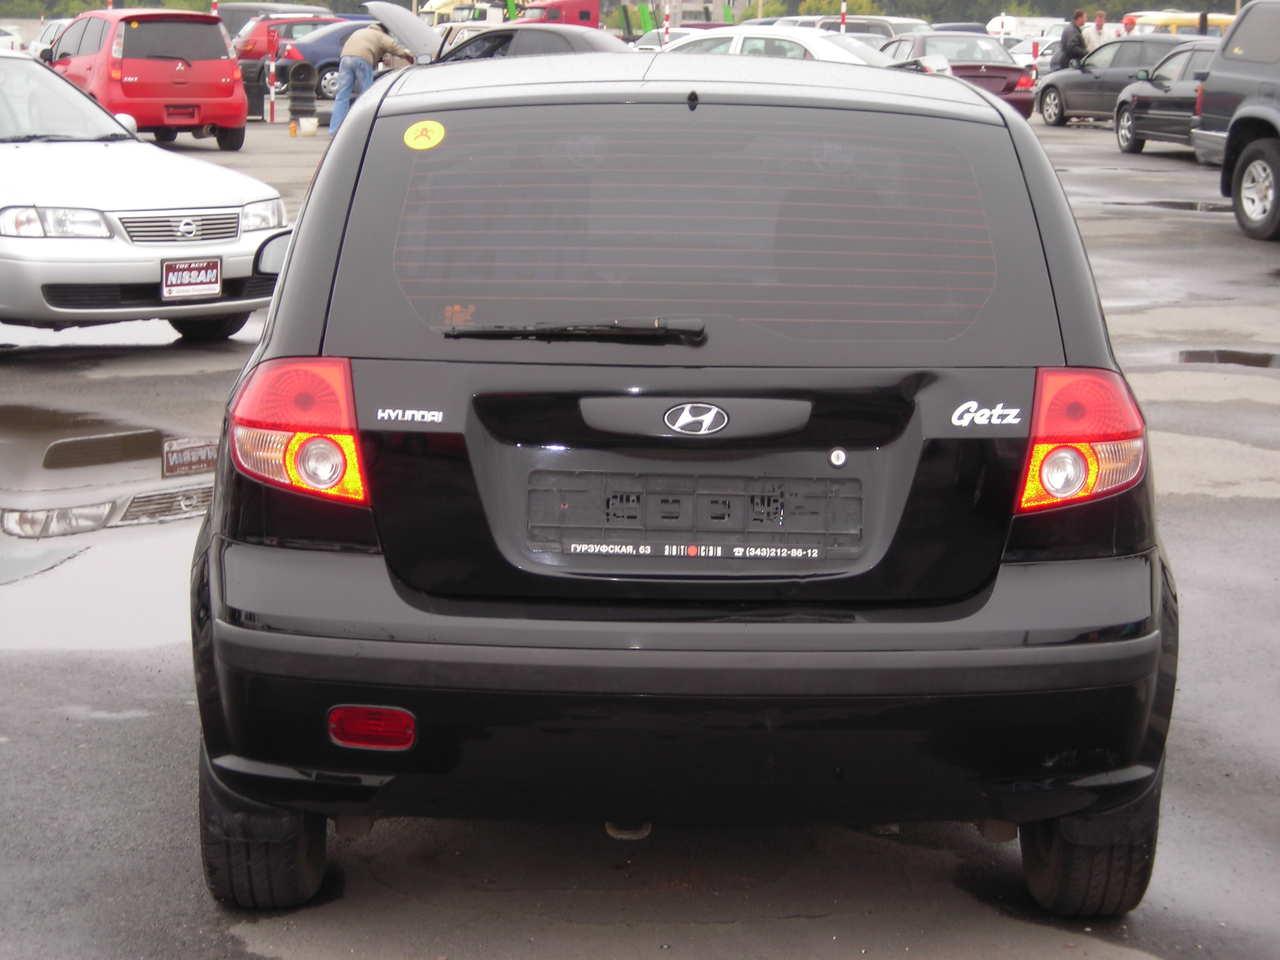 2005 Hyundai Getz Pictures 1 3l Gasoline Ff Manual For Sale